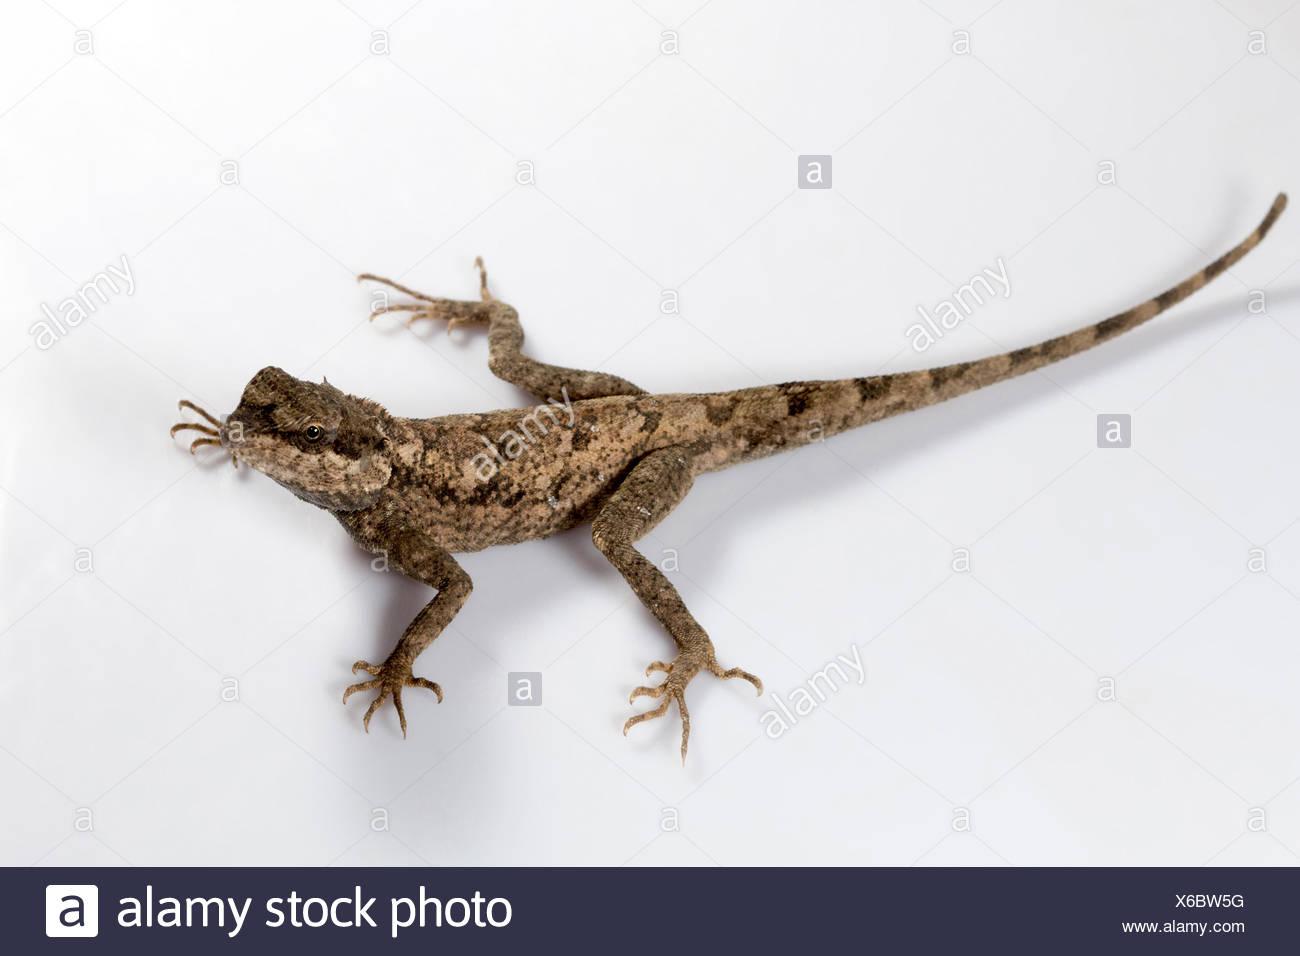 Rock agama, Psammophilus blanfordanus, Udanti Tiger Reserve, Chhattisgarh. Blanford's rock agama is found in Peninsular India - Stock Image